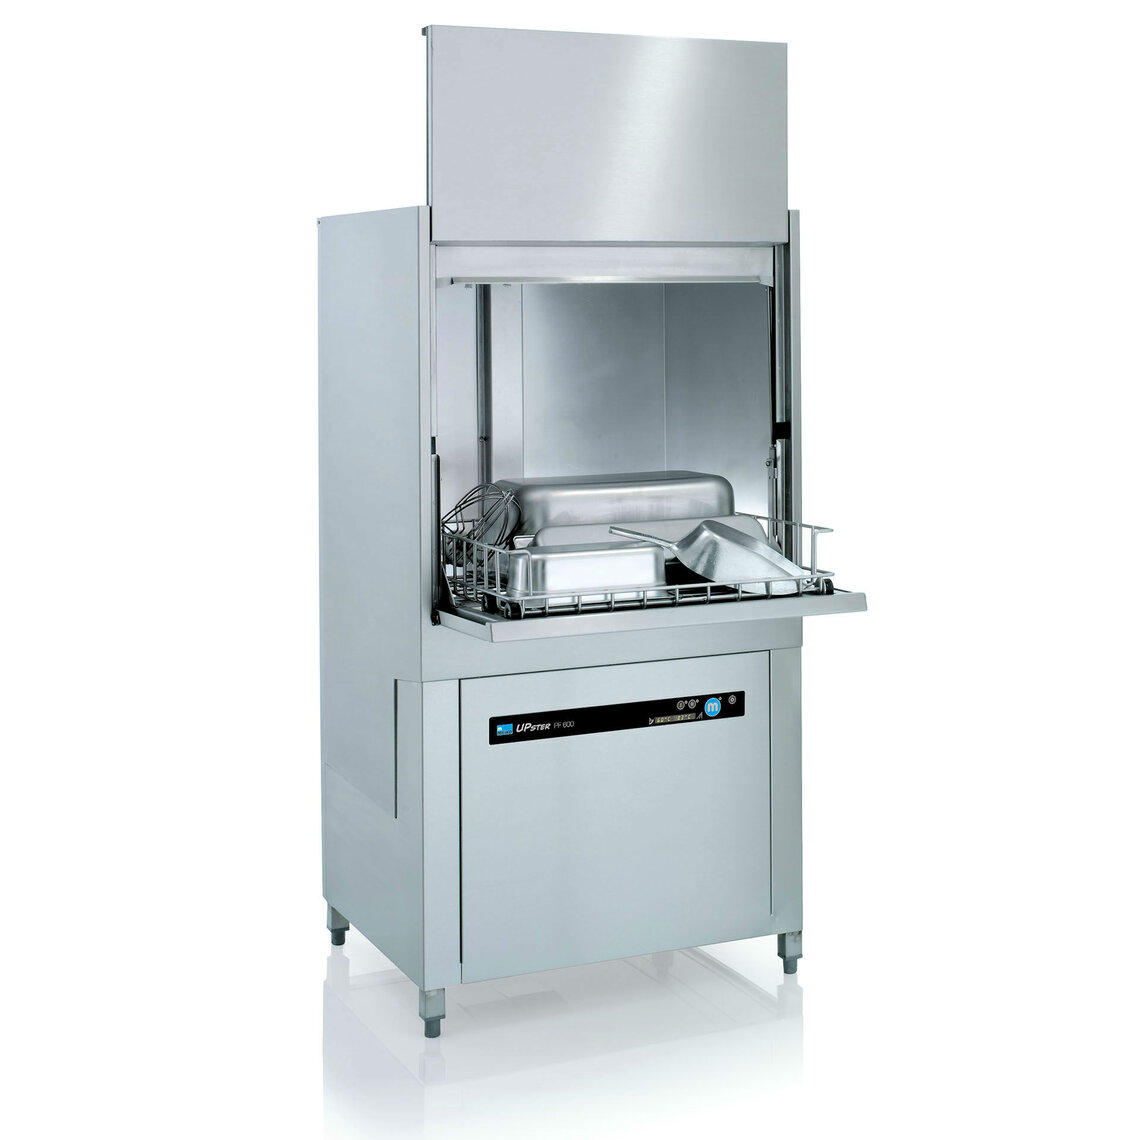 UPster PF 600 - Professional universal dishwasher - MEIKO